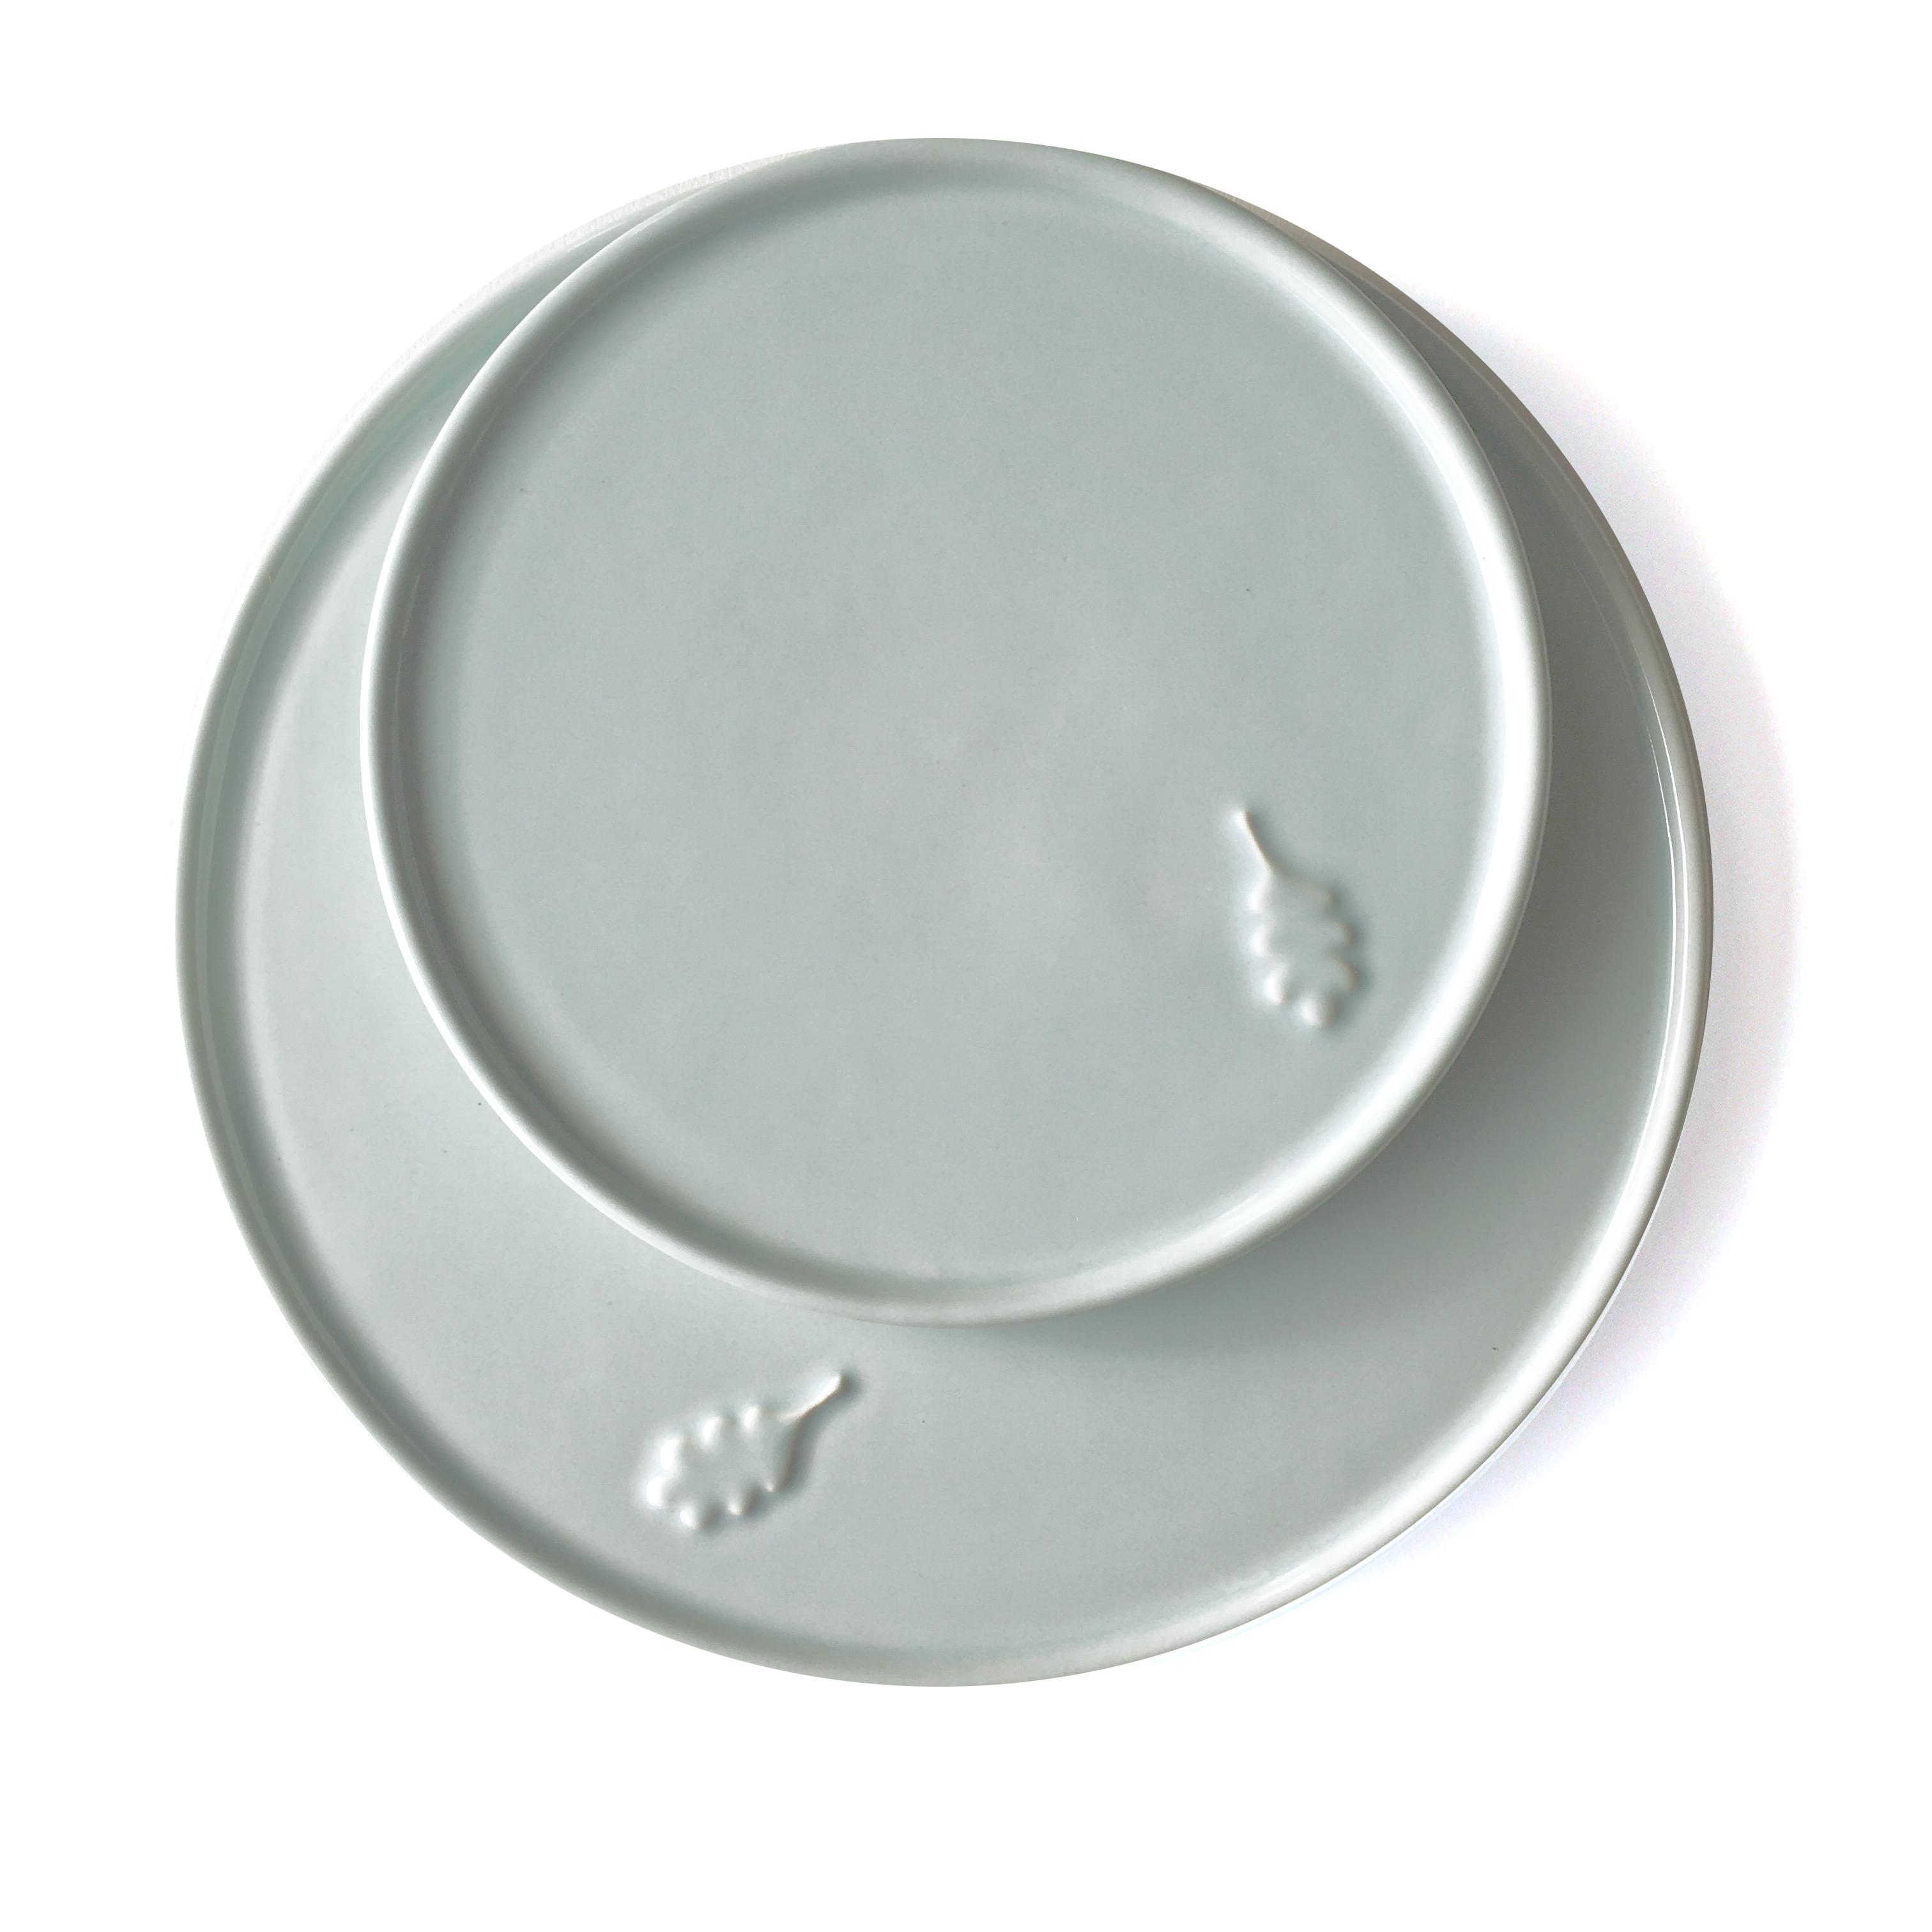 Breakfast plate, ceramics, nature, abitofnature, Ping & Moos